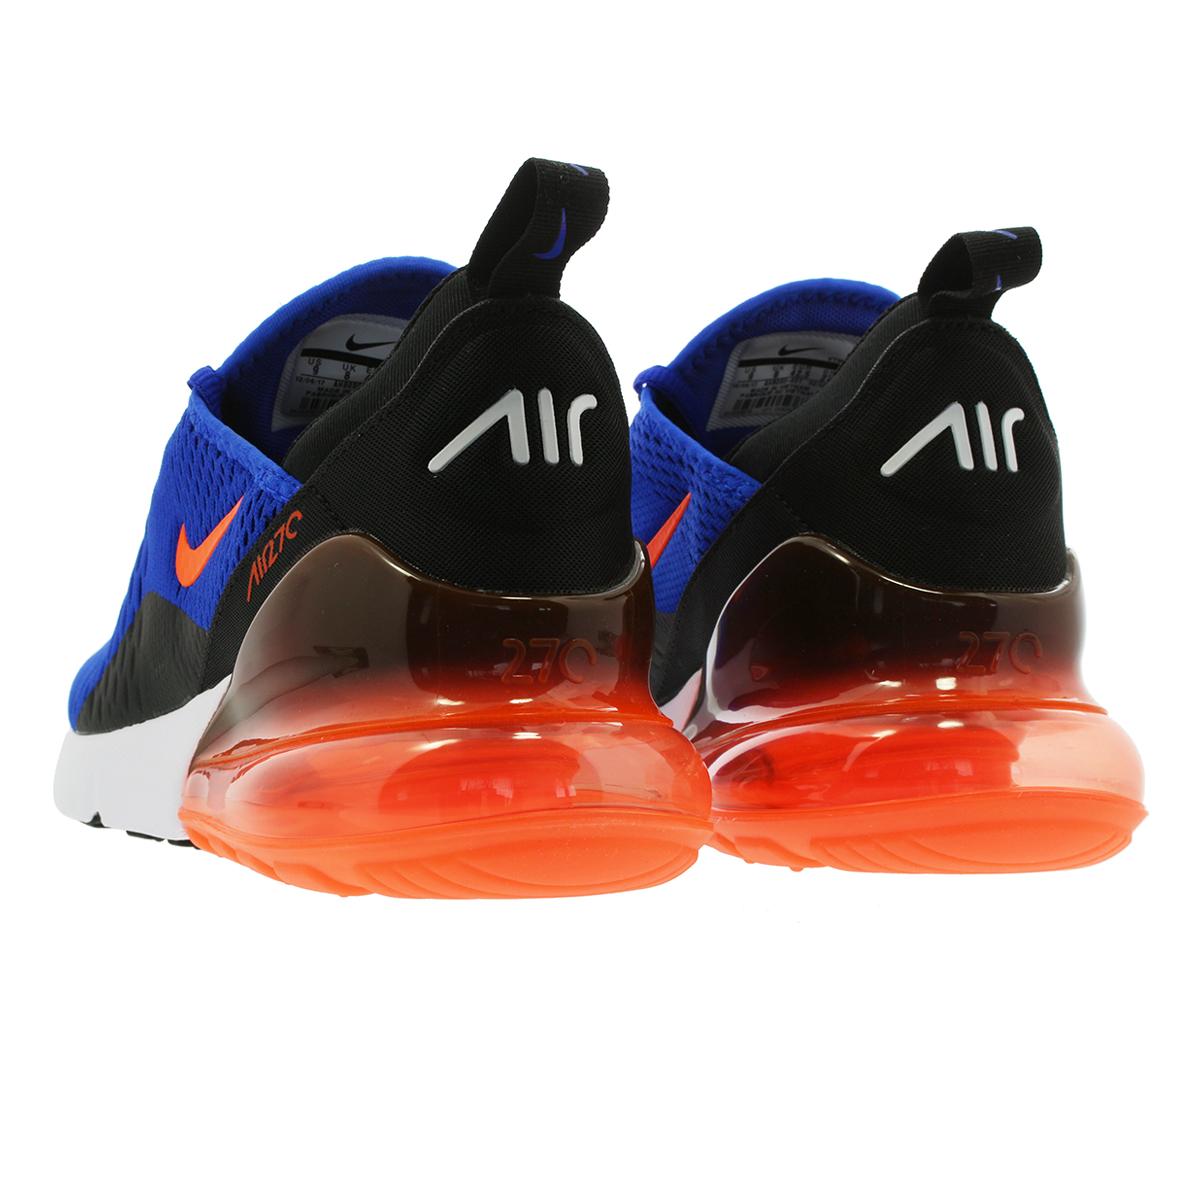 496a026b09 Men's Shoes Athletic Shoes Nike Air Max 270 Racer Blue Hyper Crimson Black  Mens Trainers AH8050-401